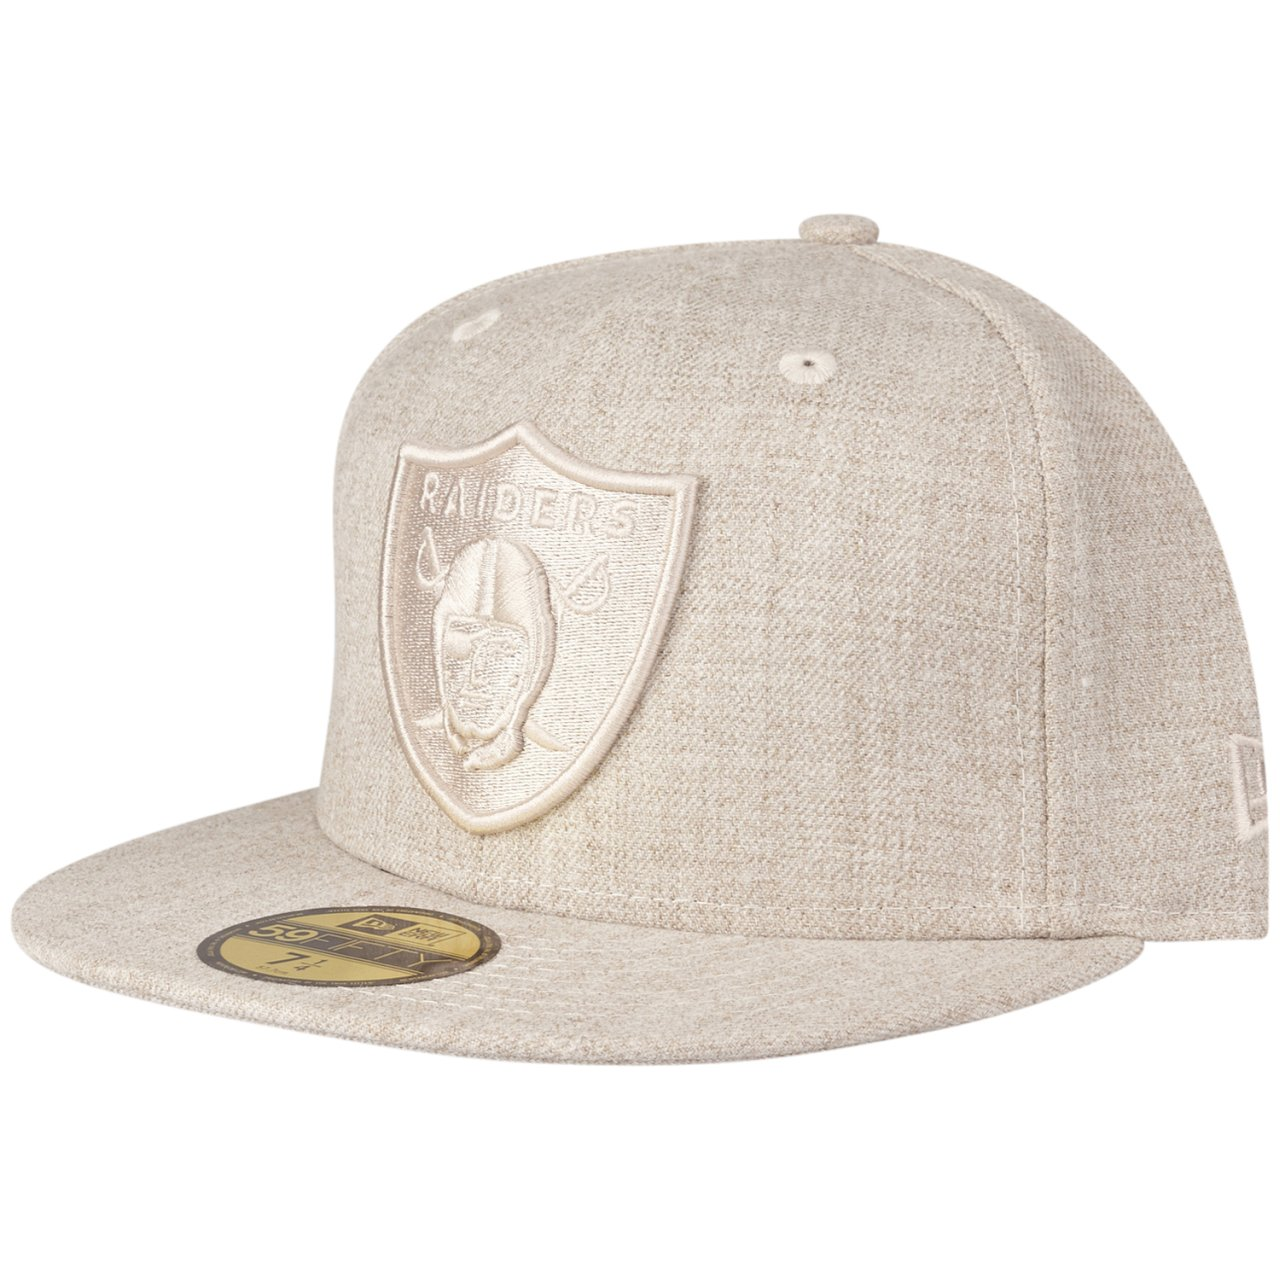 New Era 59Fifty Cap HEATHER OAT Oakland Raiders wood camo